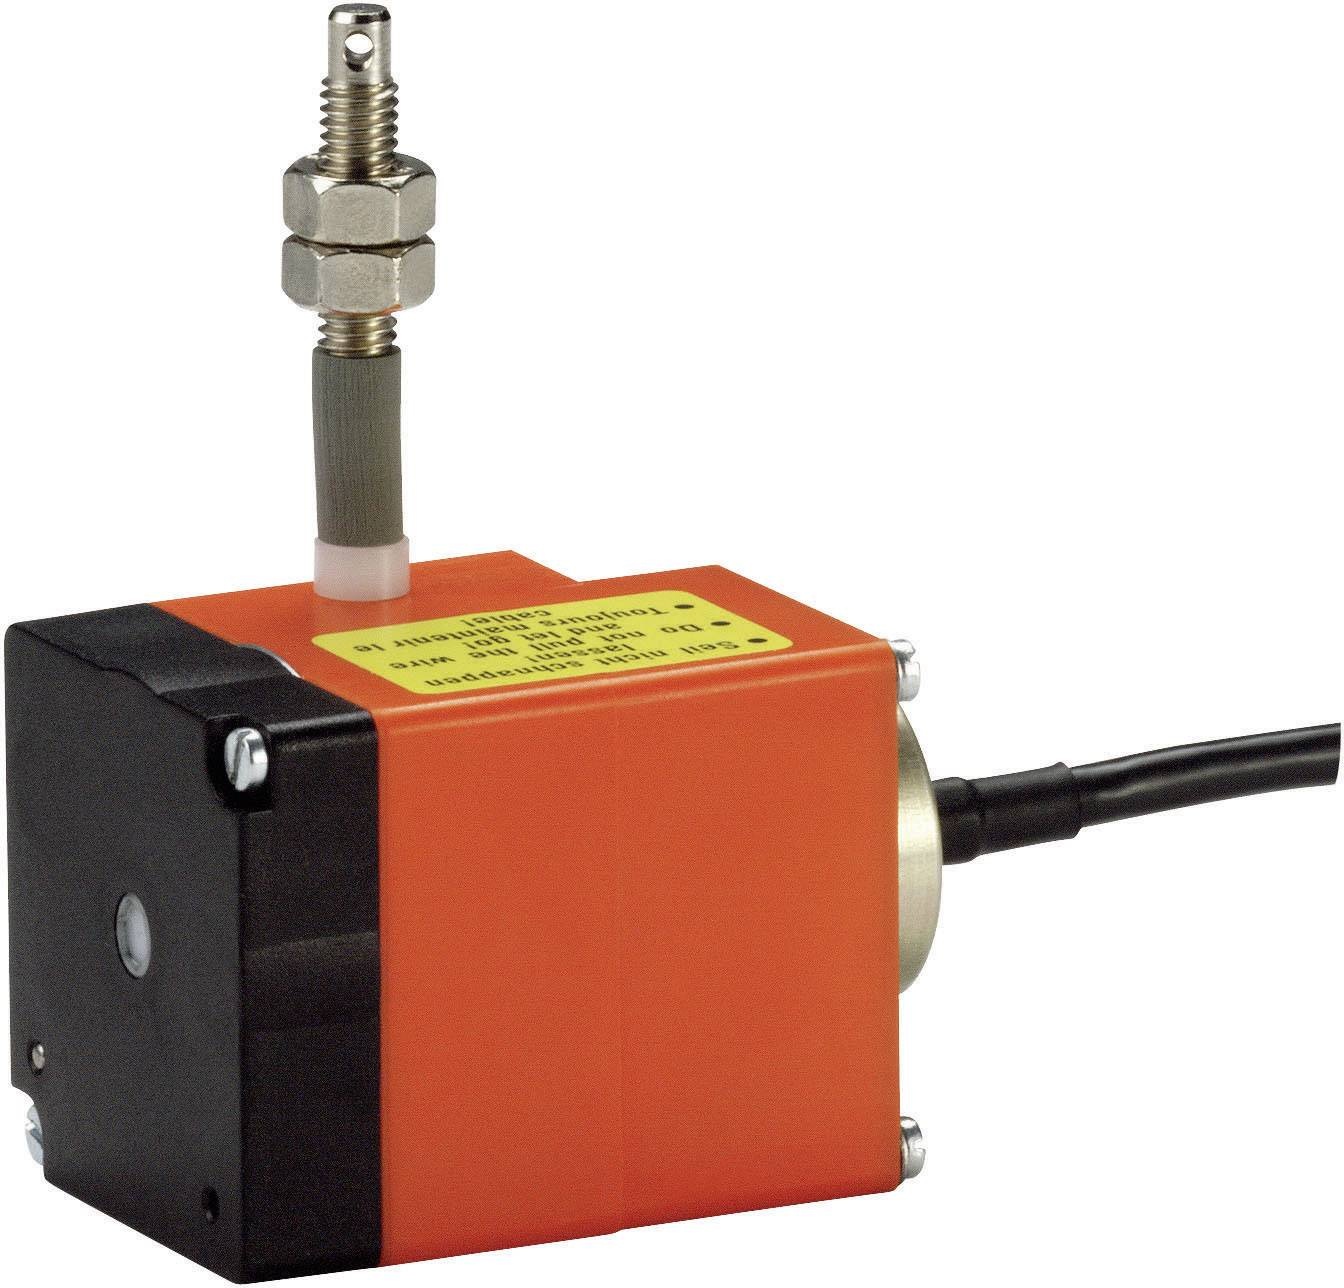 Mini ovládaný snímač Kübler D5, 0 - 10 V